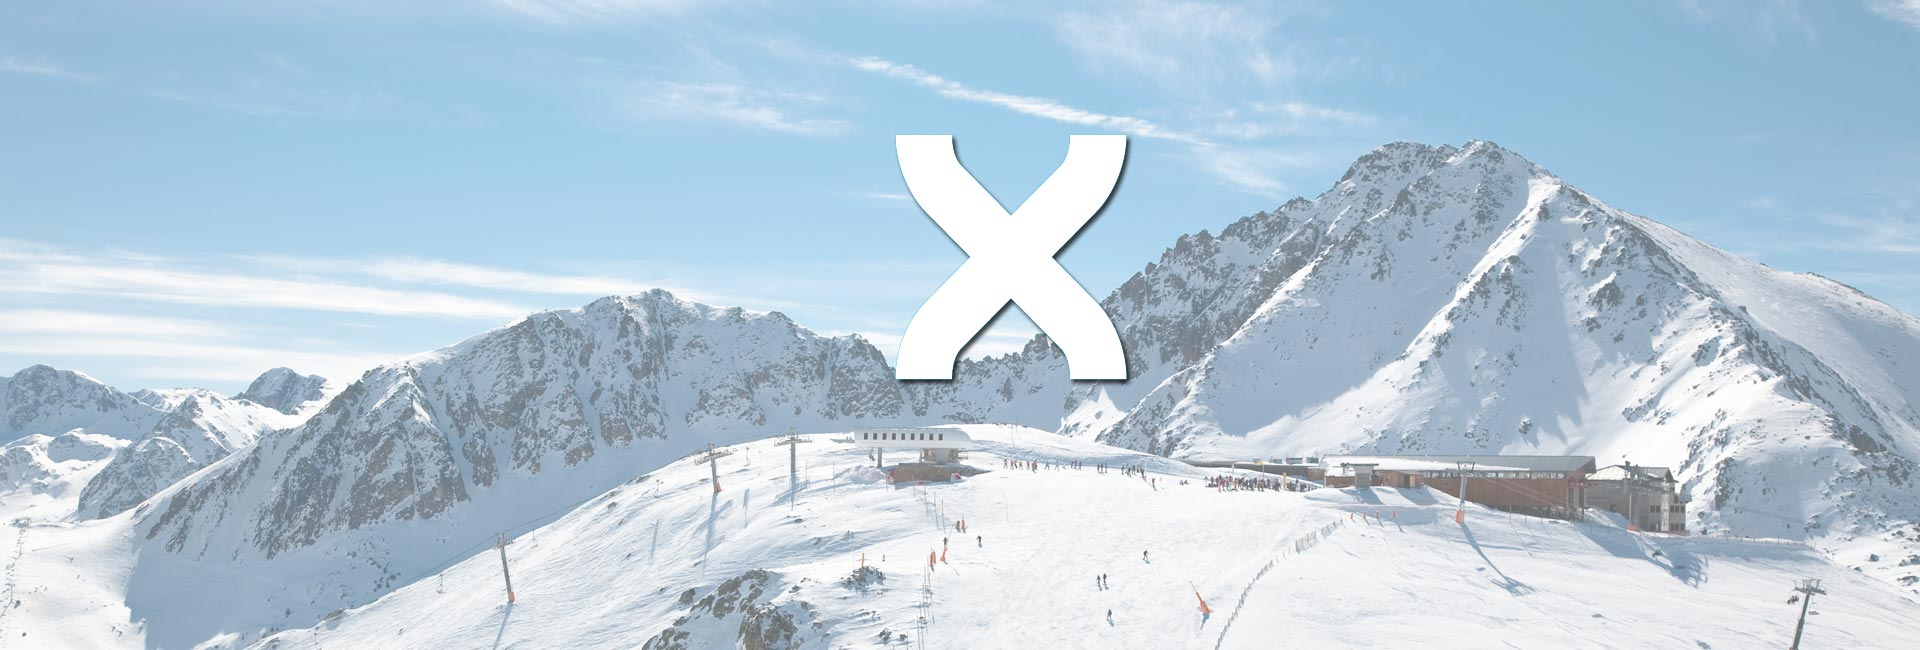 Esquiar en Grandvalira. Esquiar en Andorra